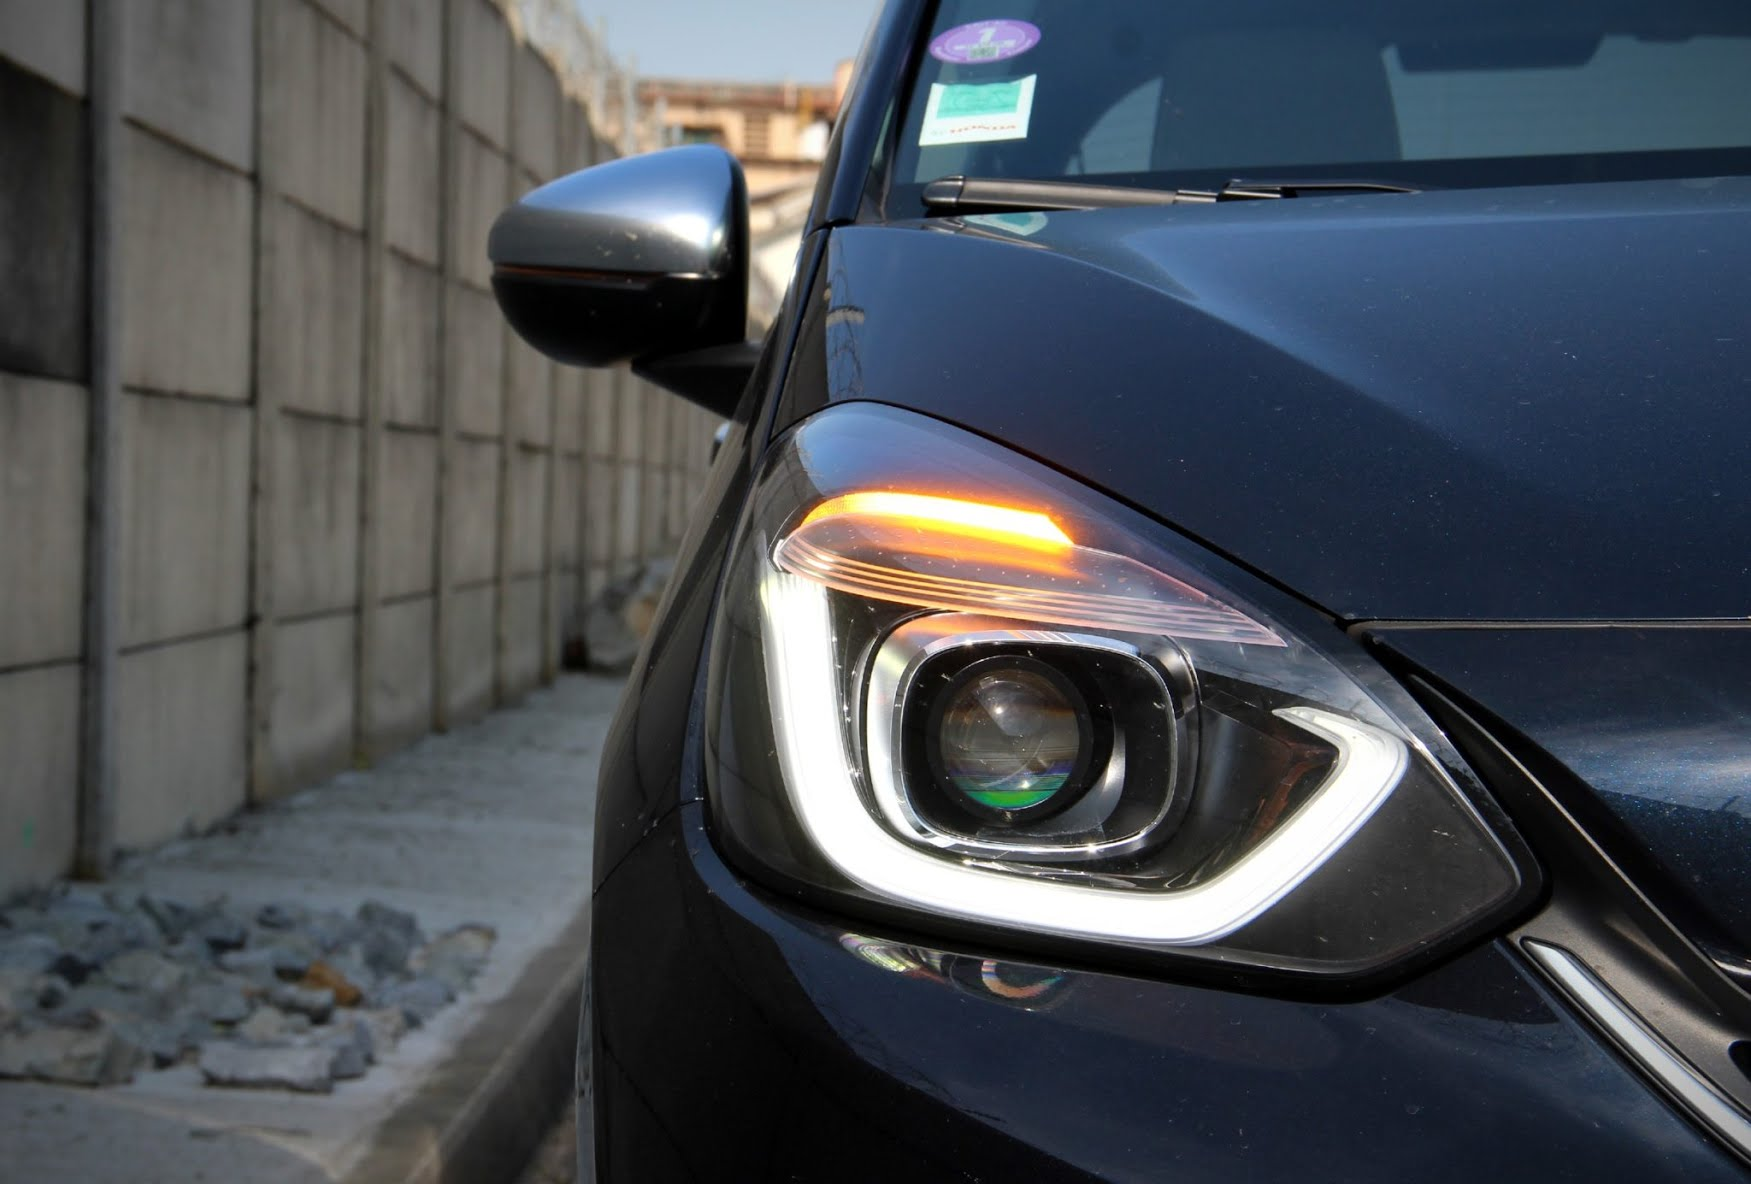 Phares de la Honda Jazz hybride